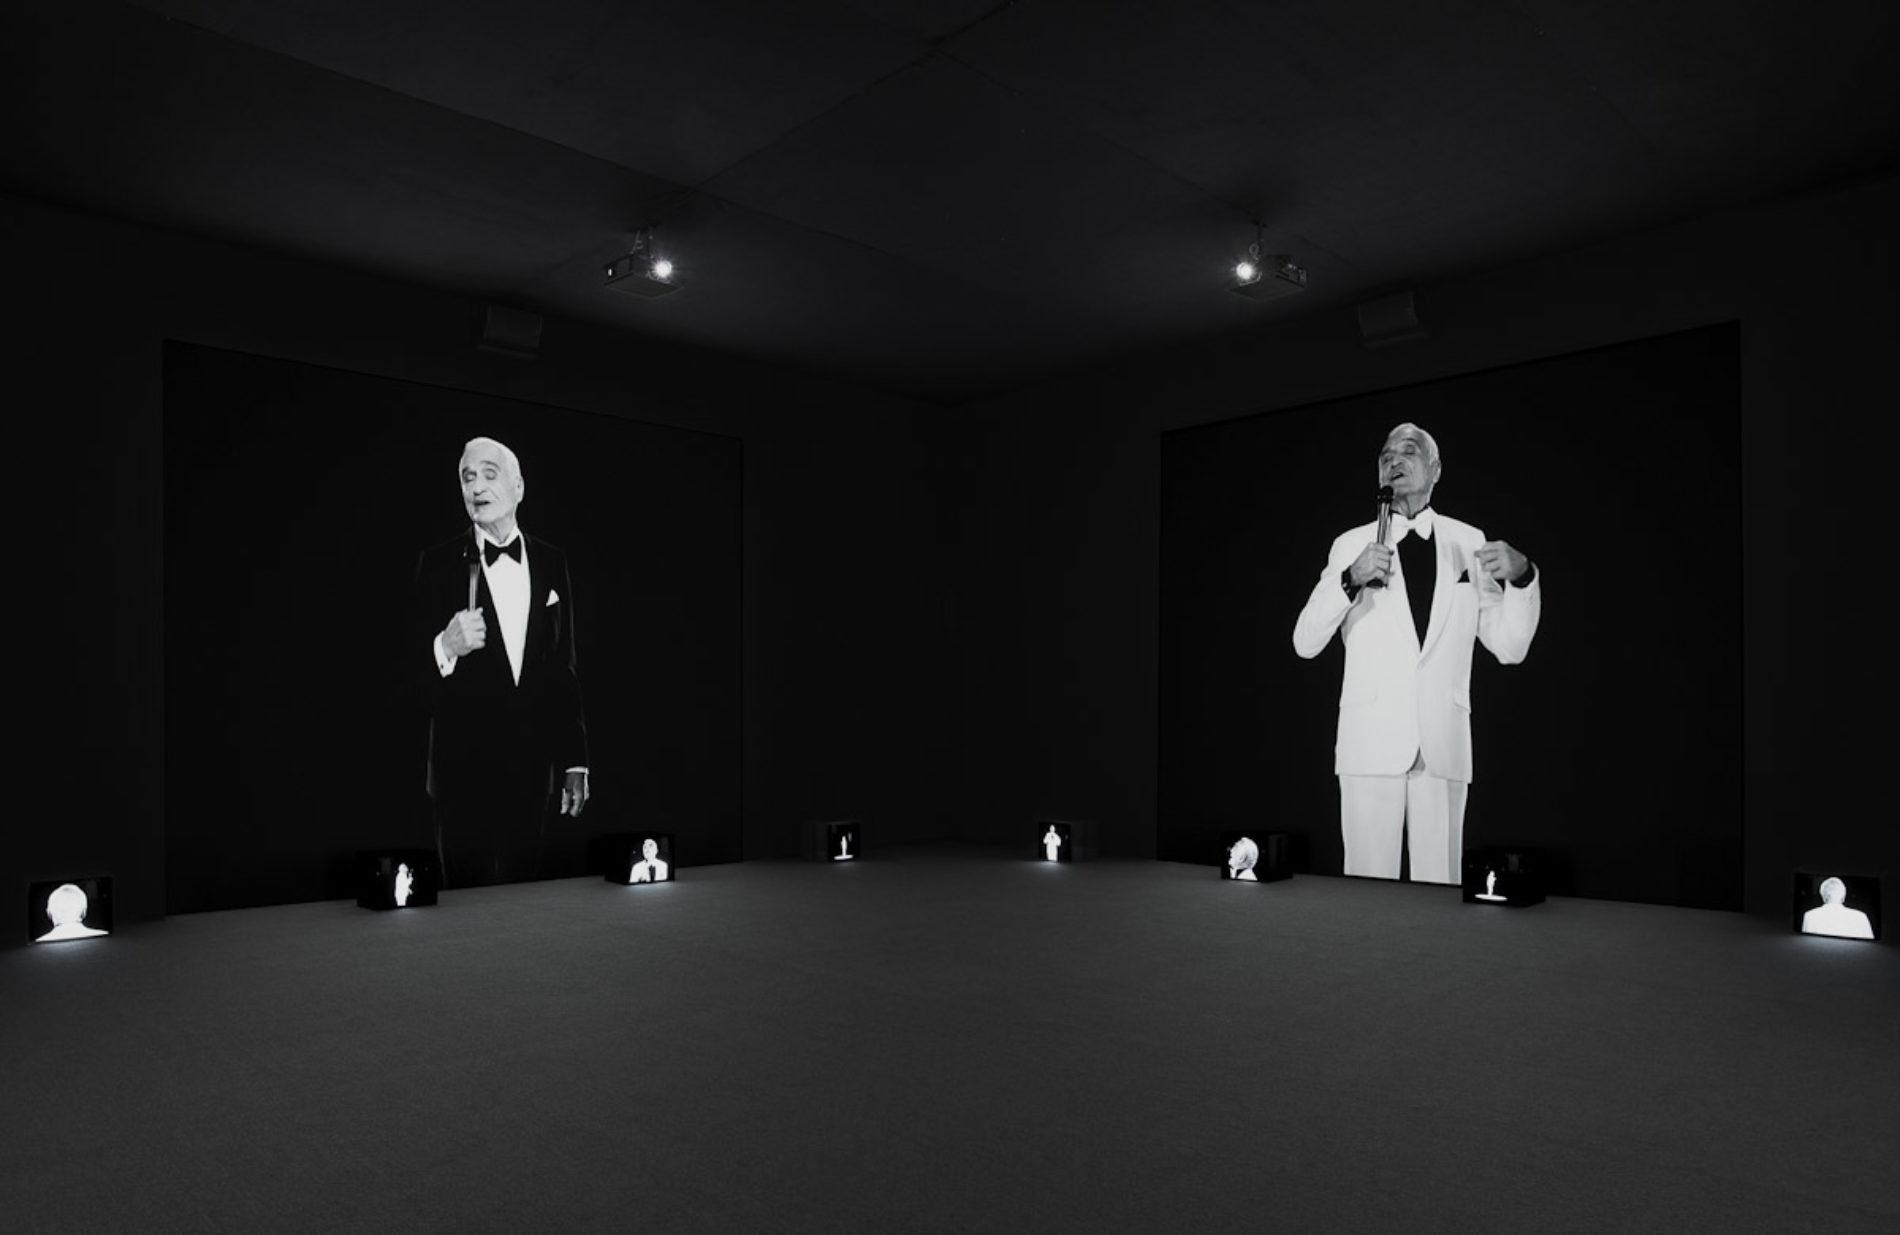 UGO RONDINONE / thanx 4 nothing (A Tribute to John Giorno) / Nov 23, 2019 – Jan 18, 2020